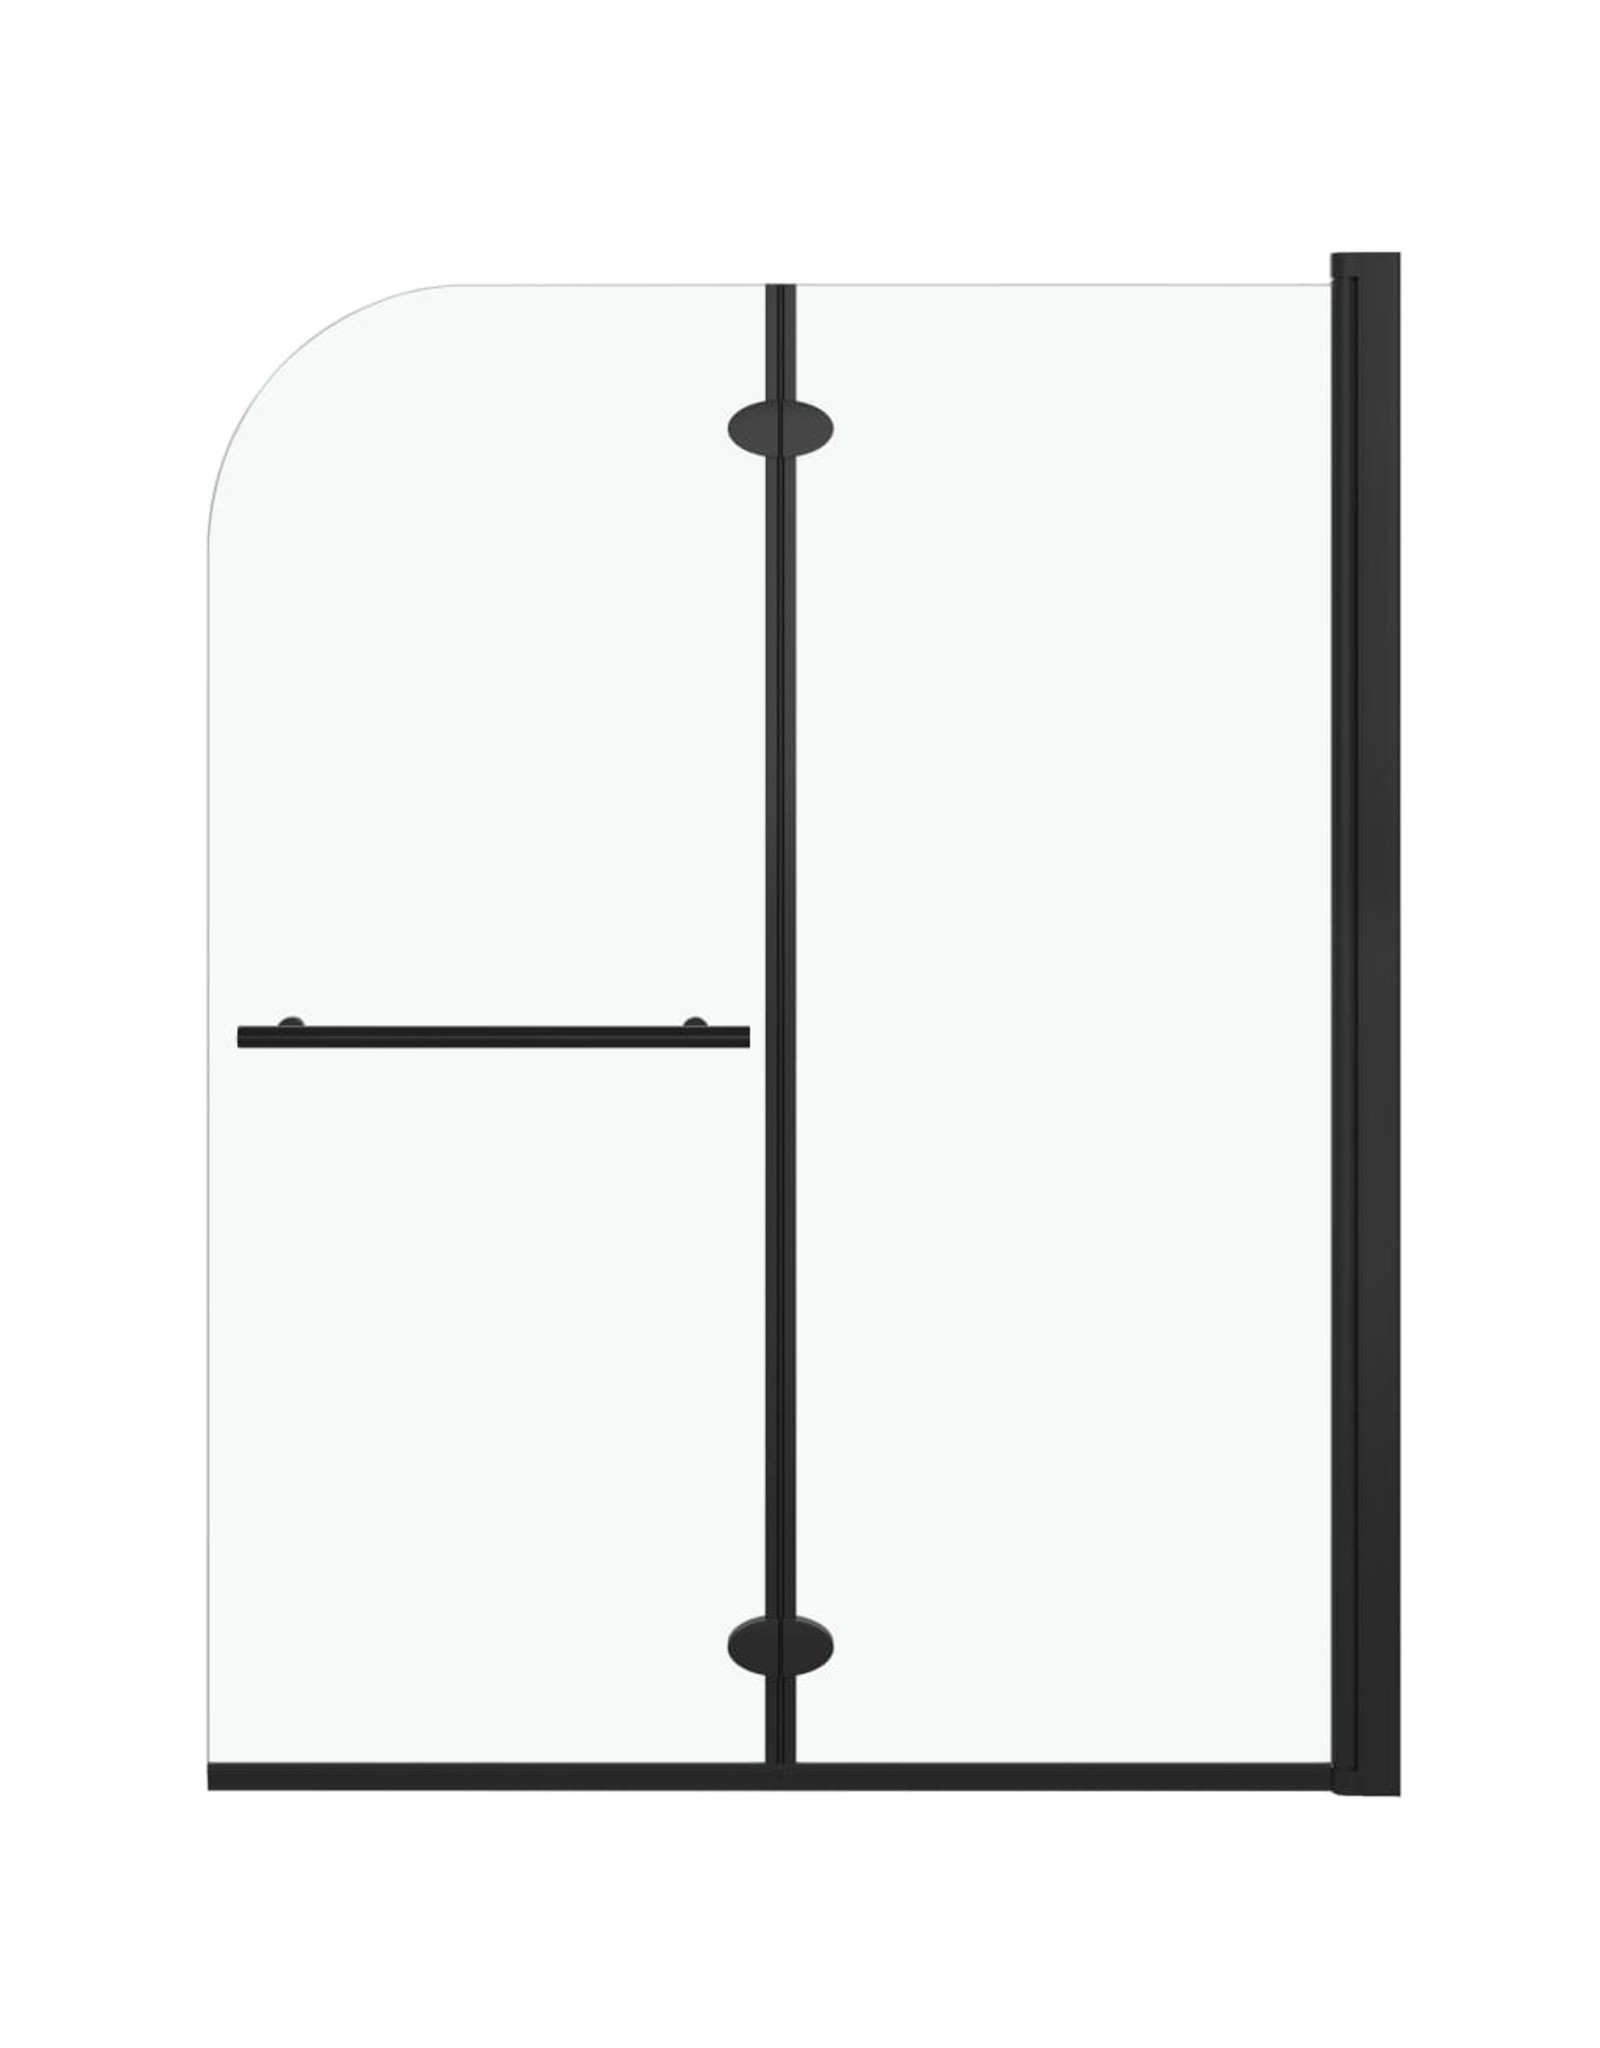 Douchewand inklapbaar 2 panelen 95x140 cm ESG zwart